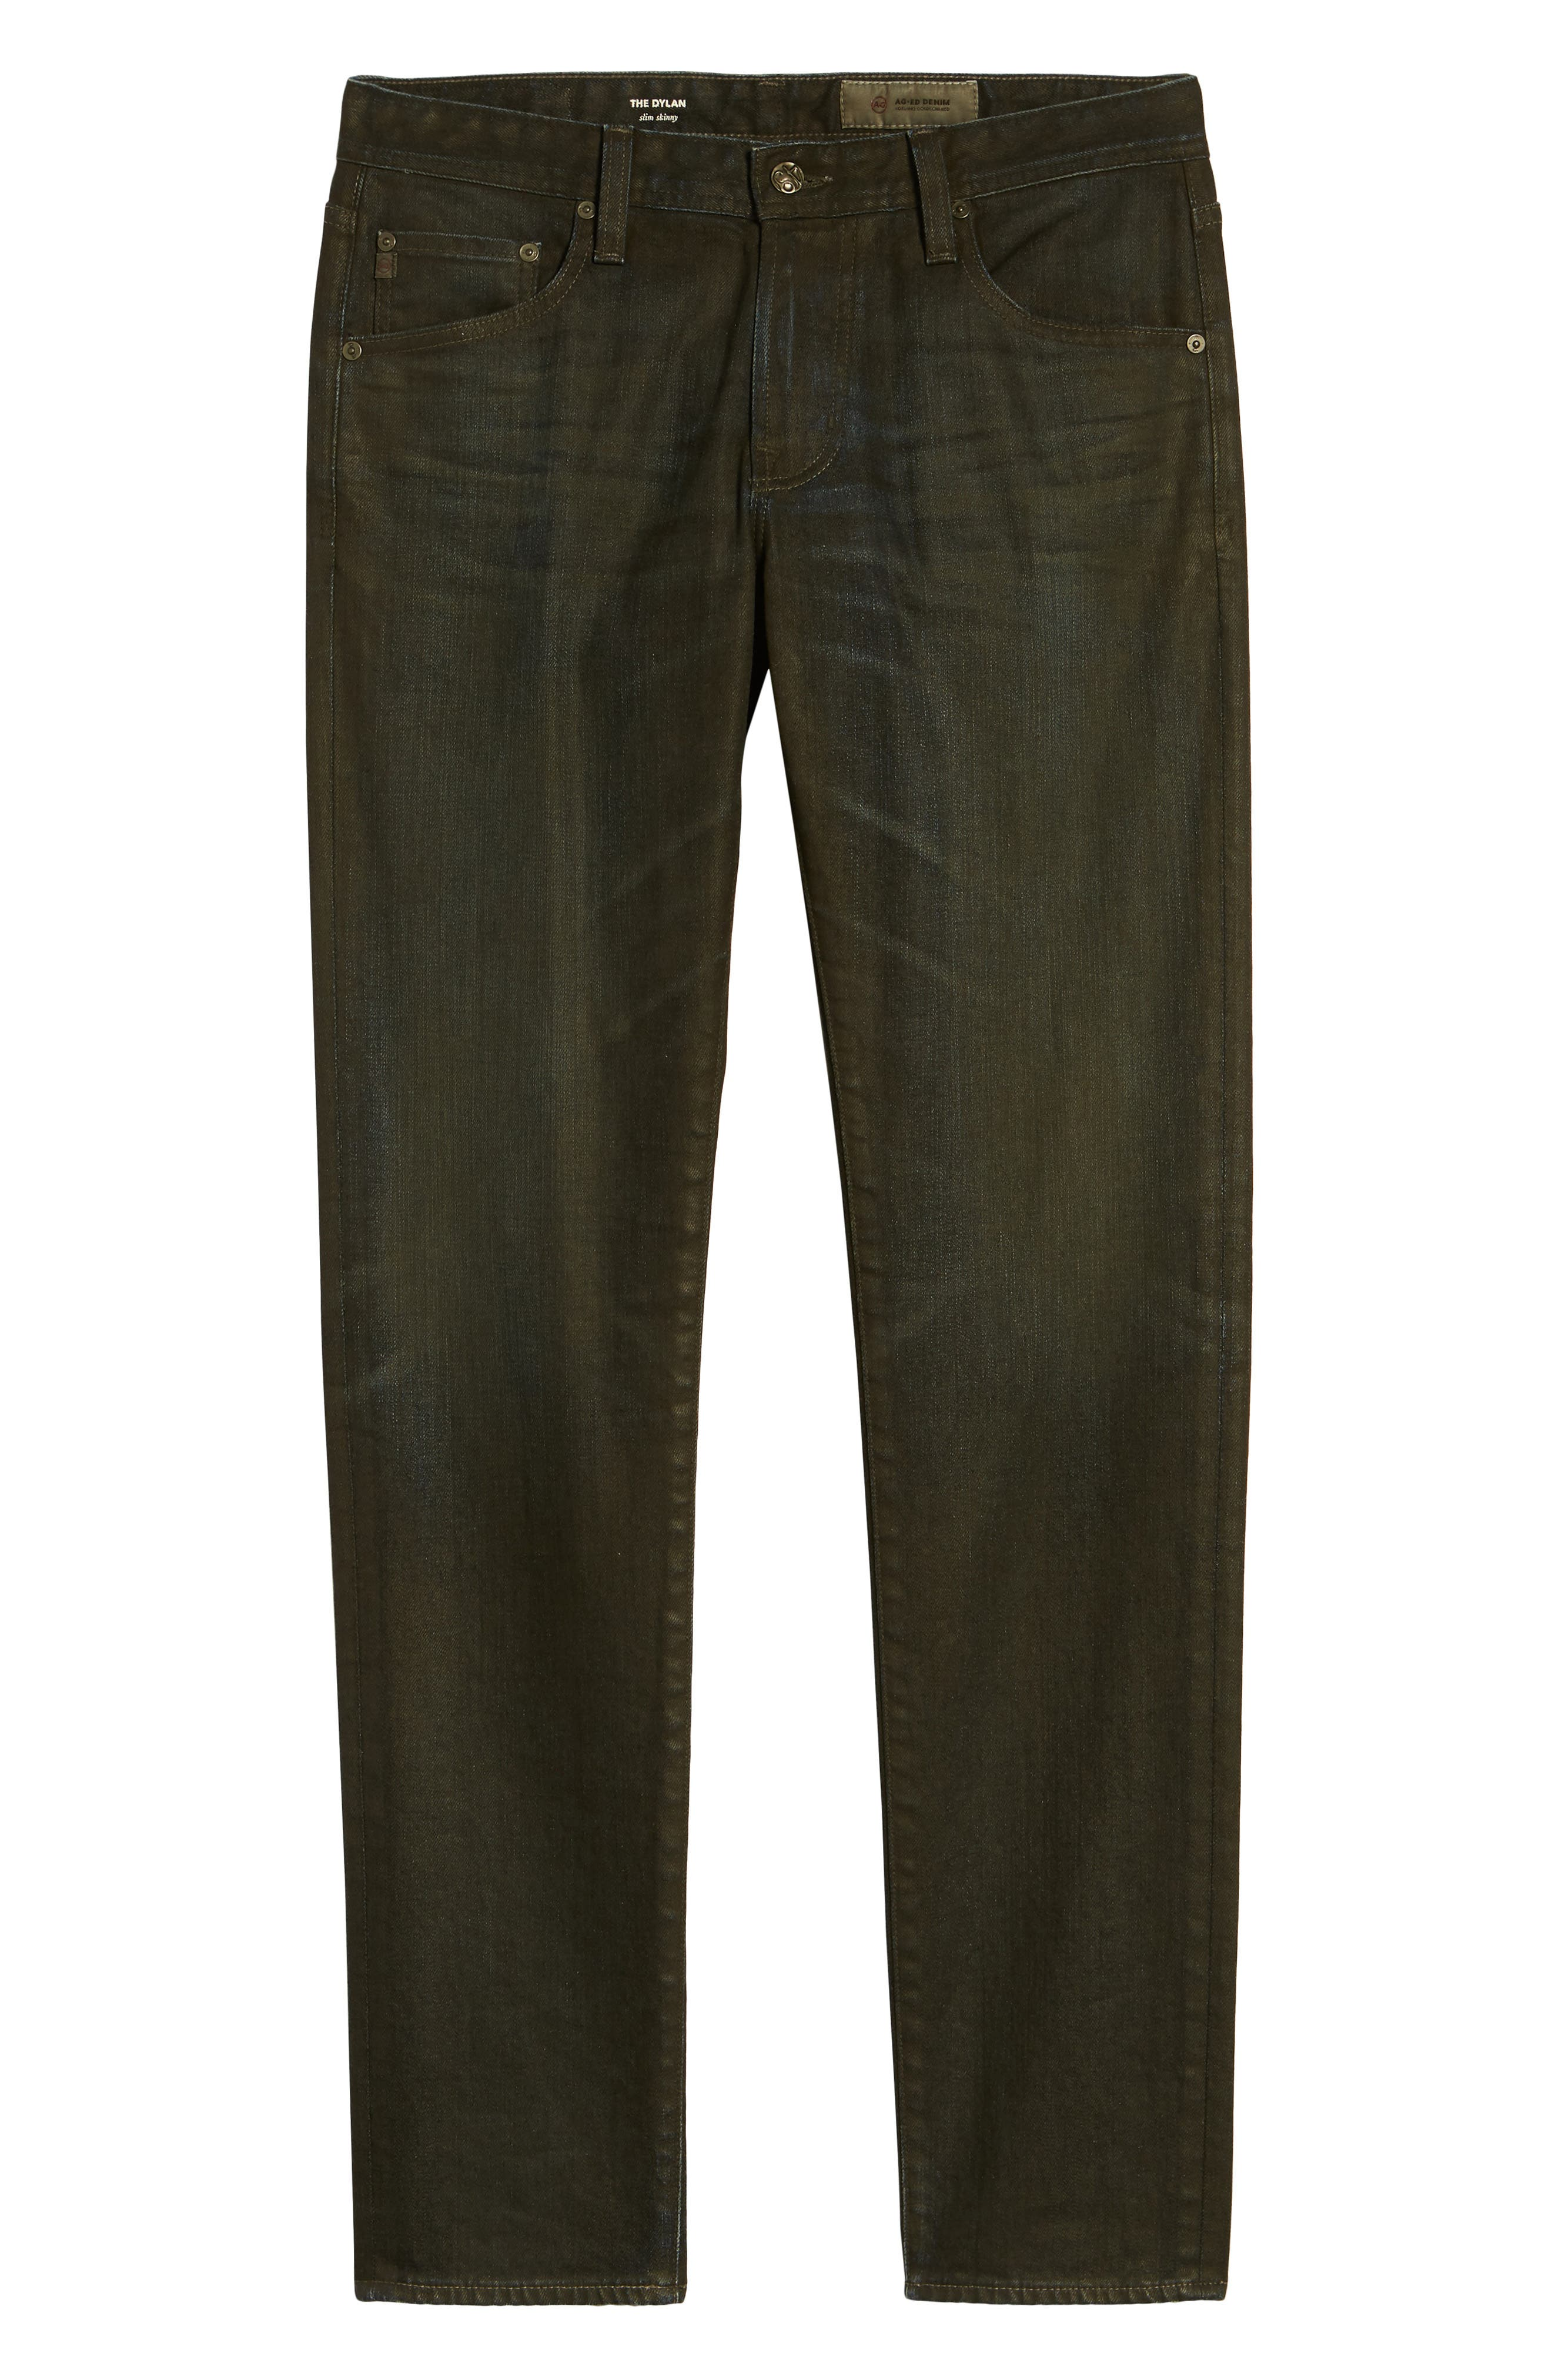 Dylan Skinny Fit Jeans,                             Alternate thumbnail 6, color,                             477